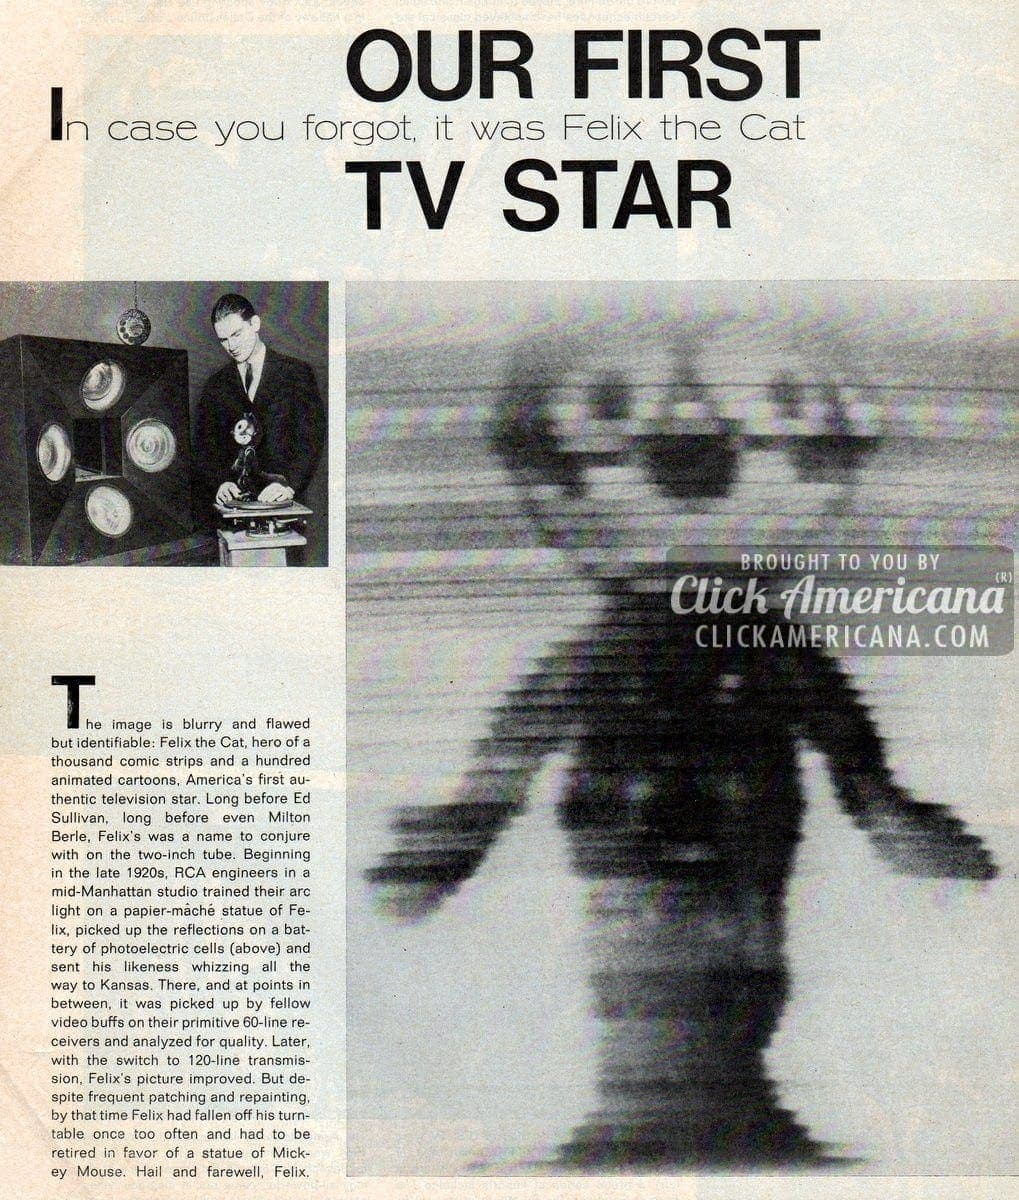 first-tv-star-felix-cat-vintage-1971